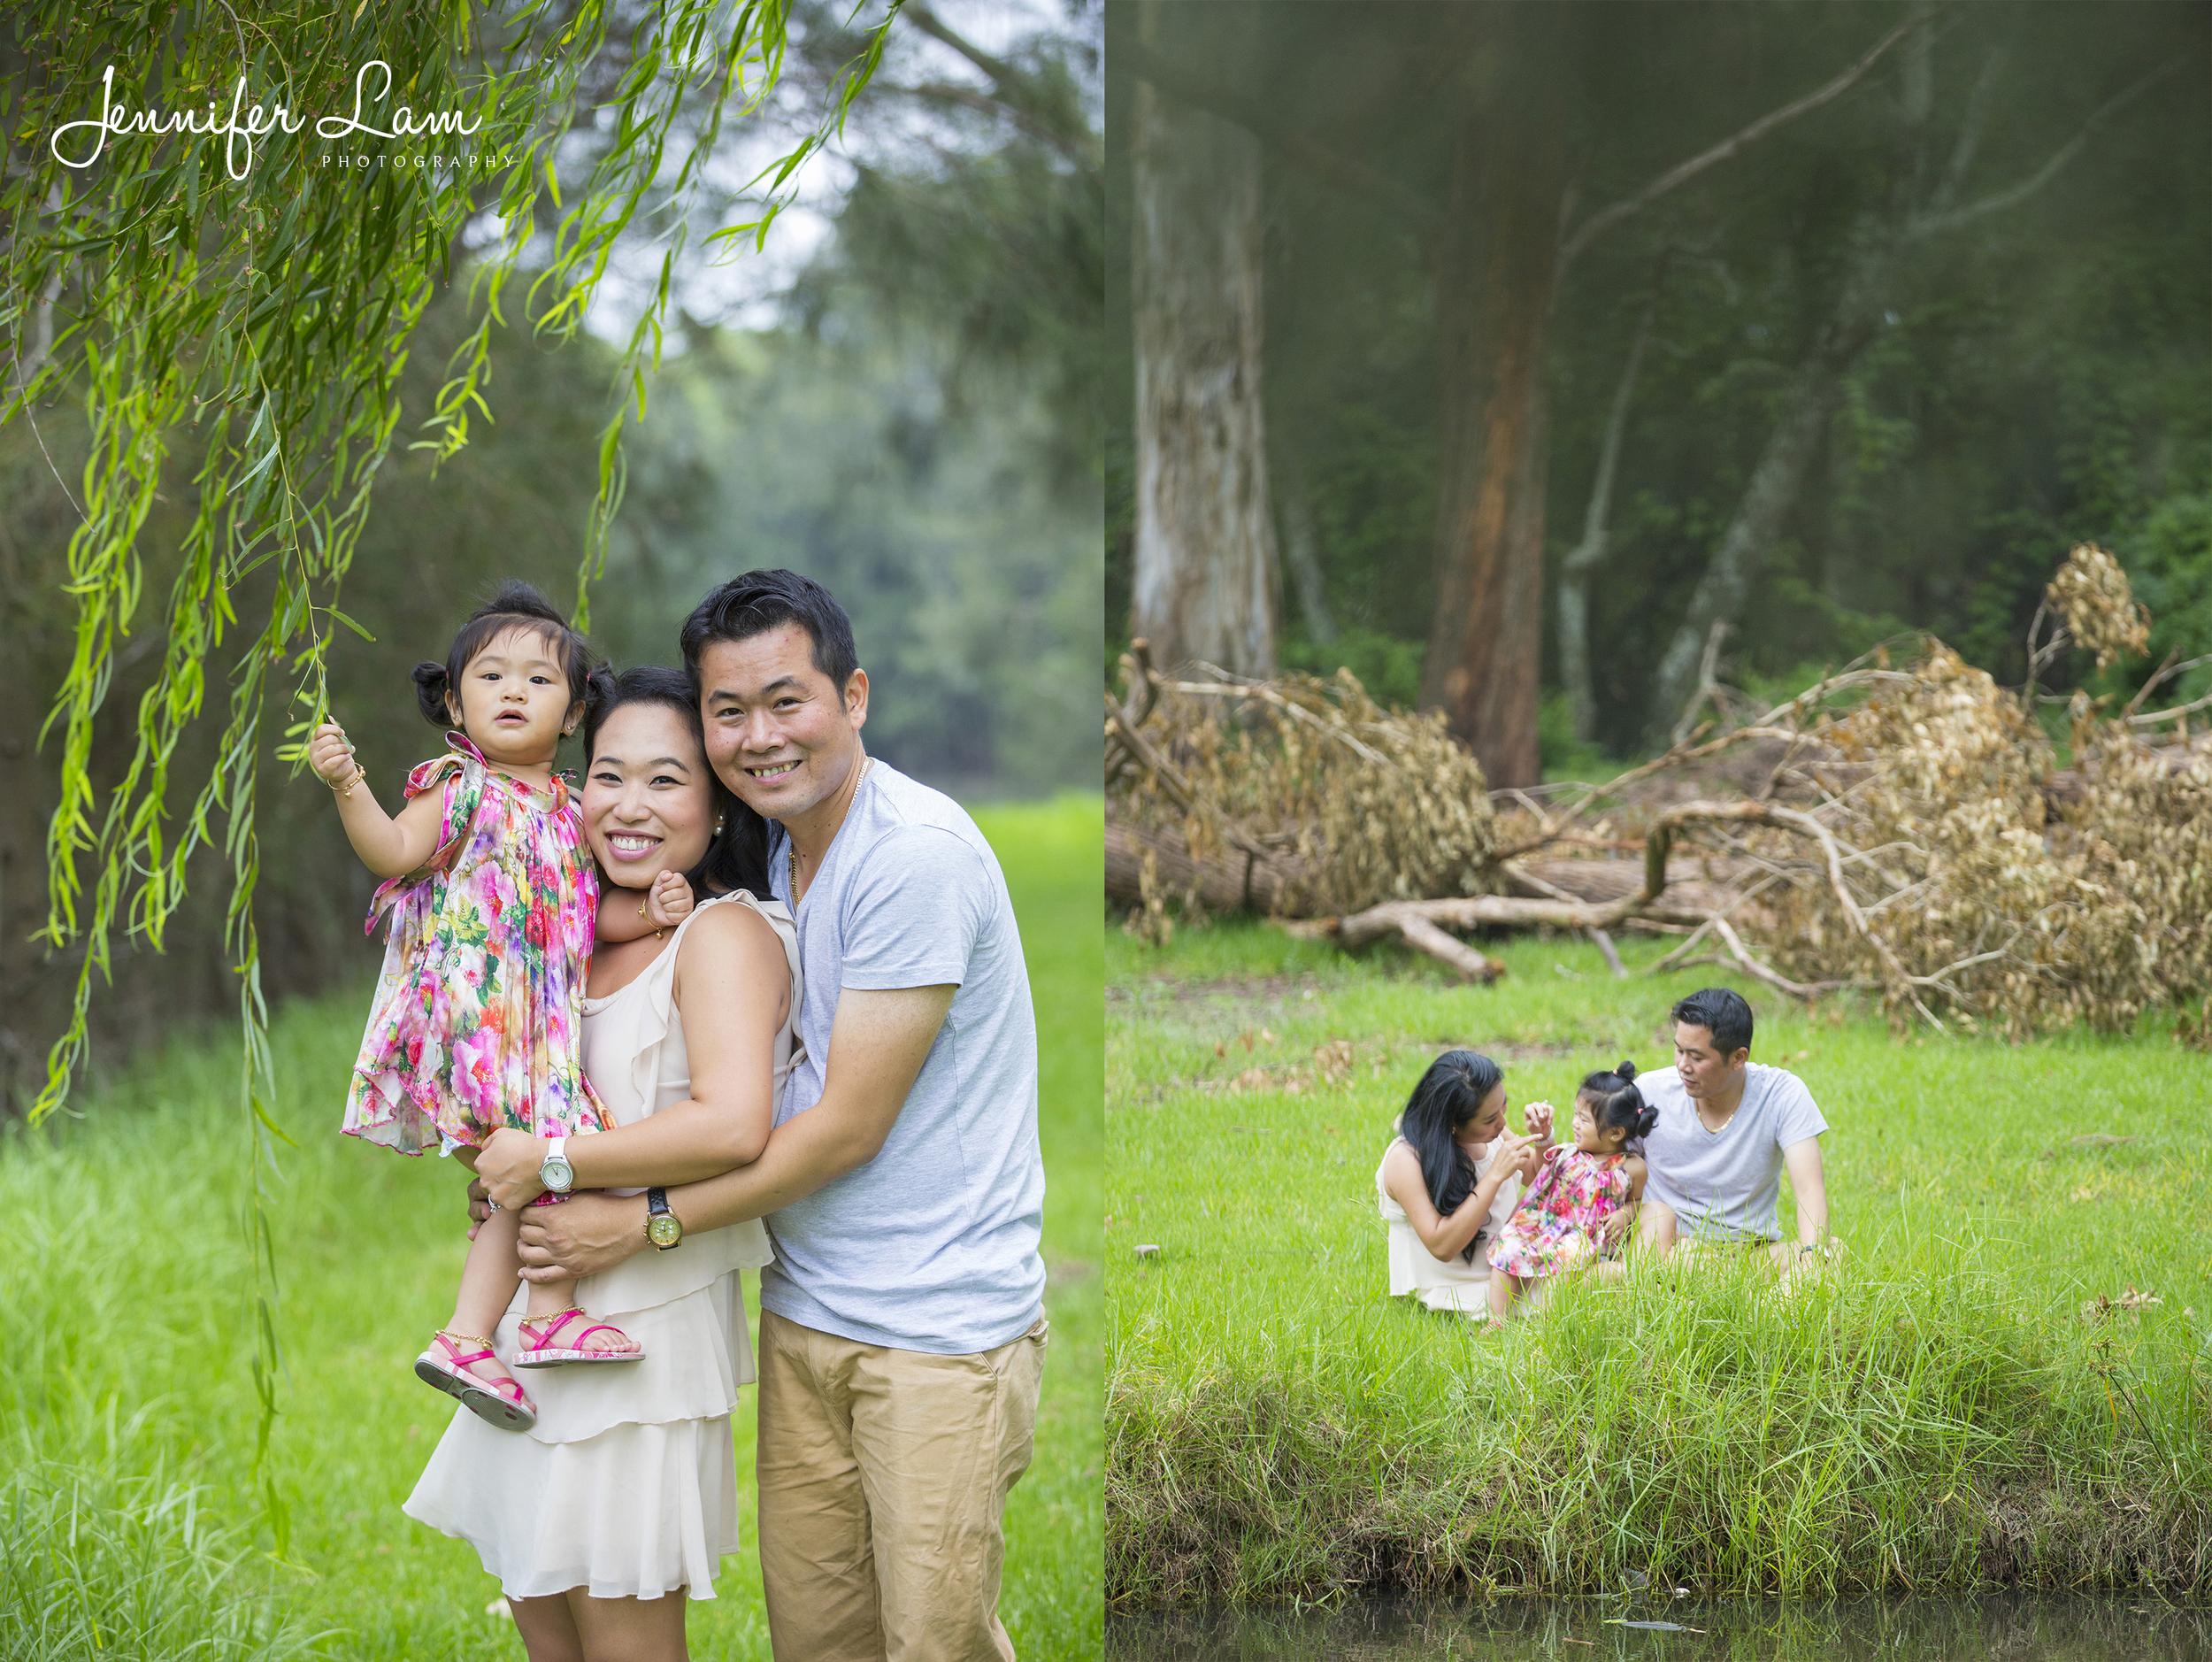 Family Portrait Session - Sydney - Jennifer Lam Photography (17).jpg